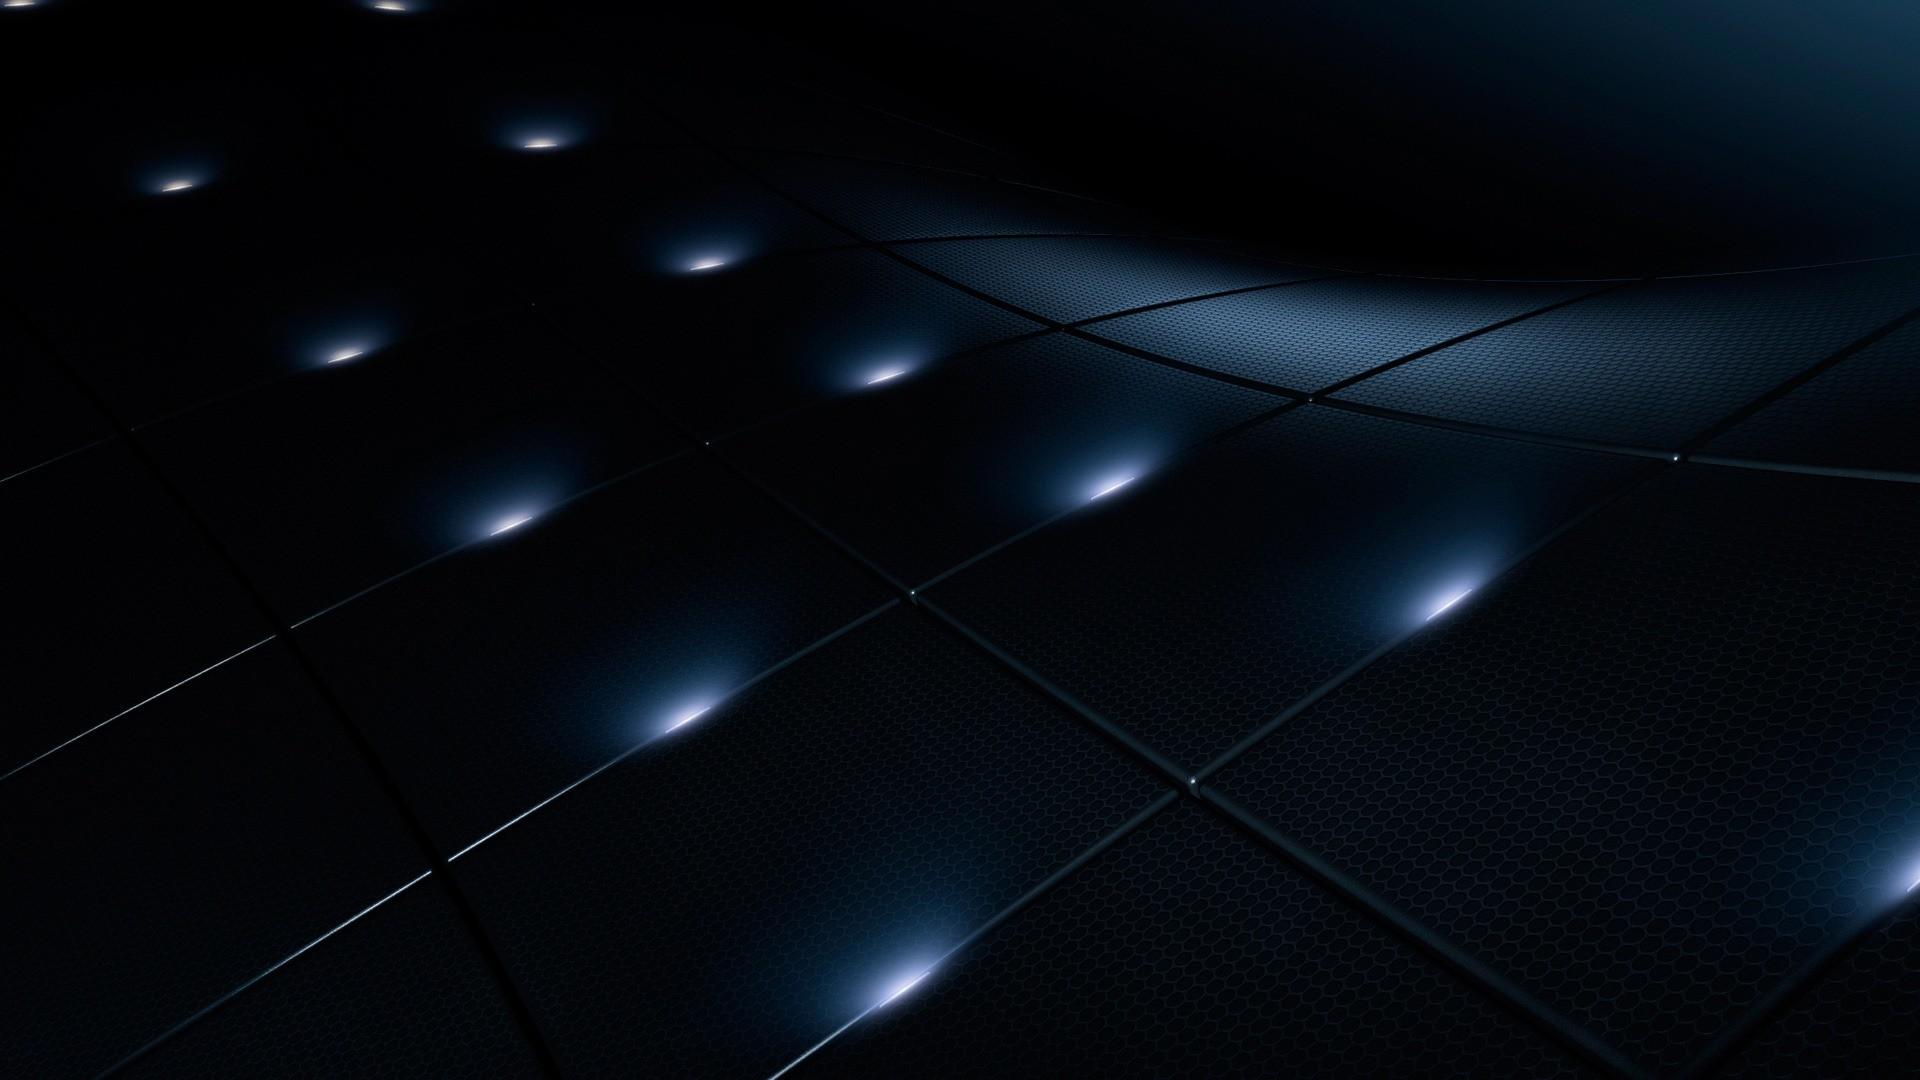 Abstract Wallpaper: Windows Carbon Fiber Desktop Background .